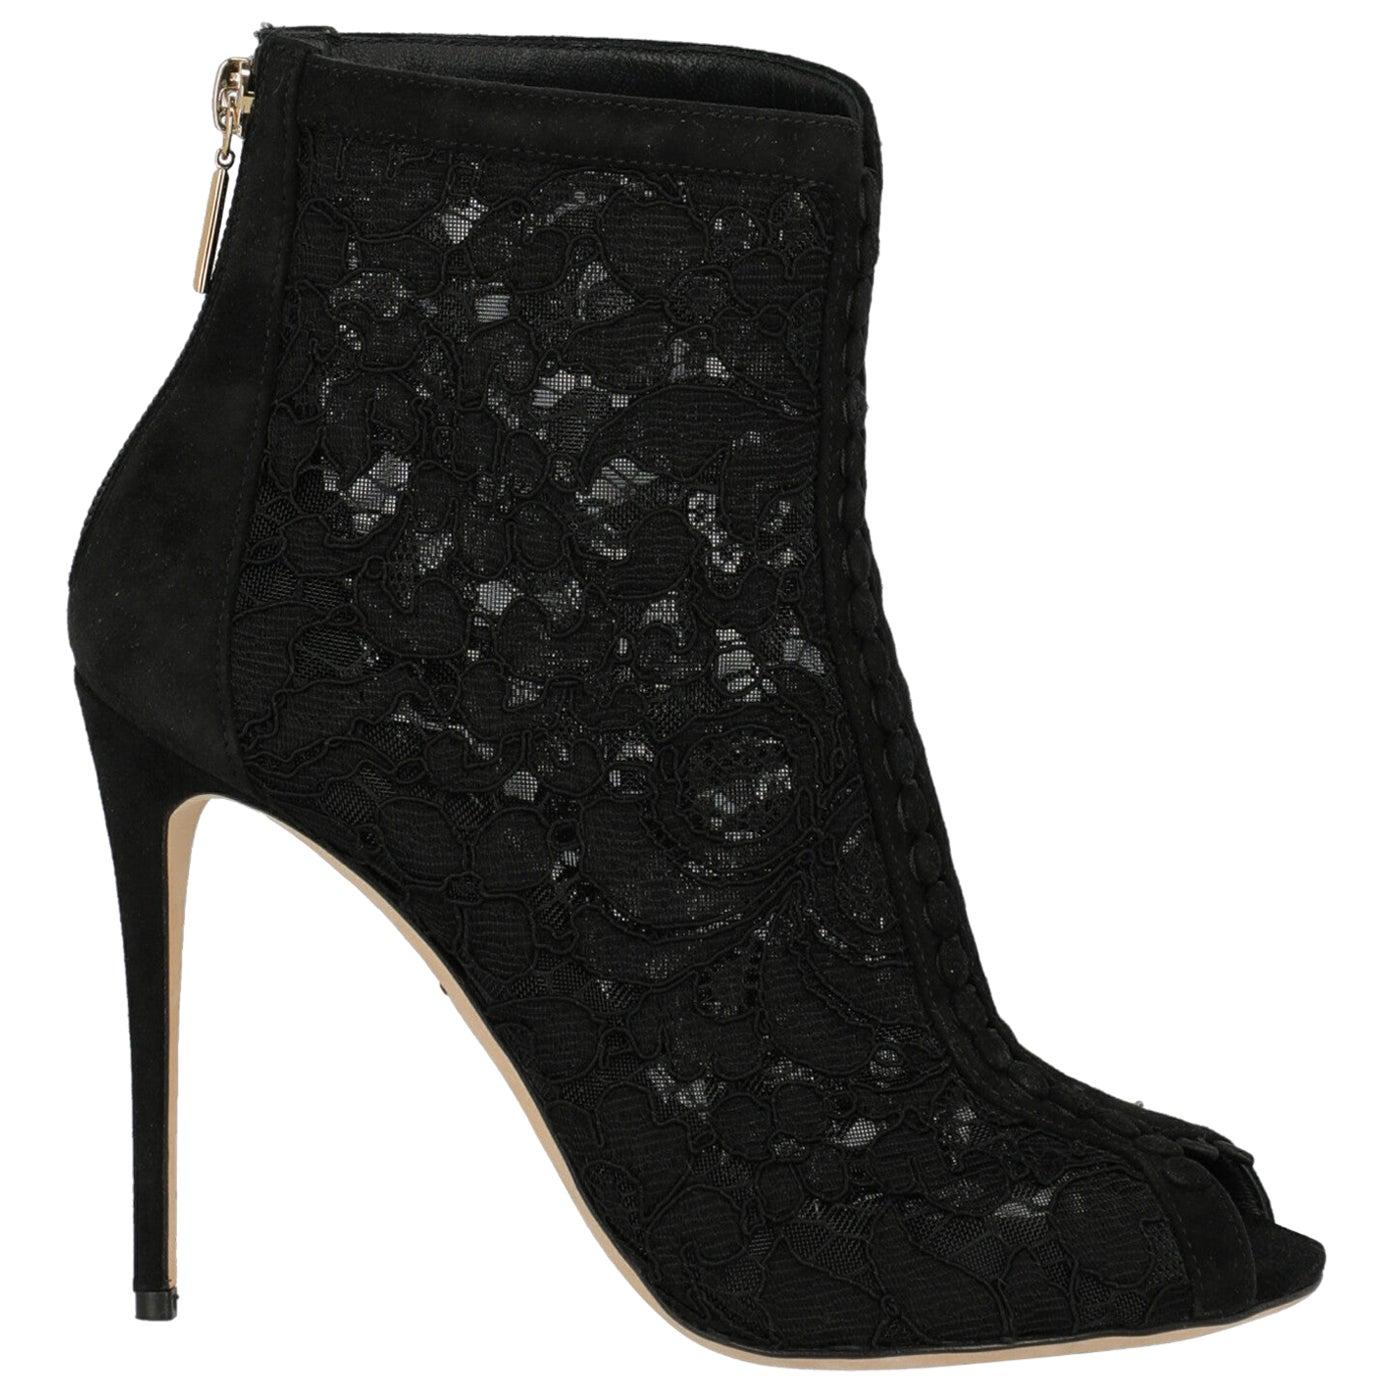 Dolce & Gabbana Woman Ankle boots Black IT 37